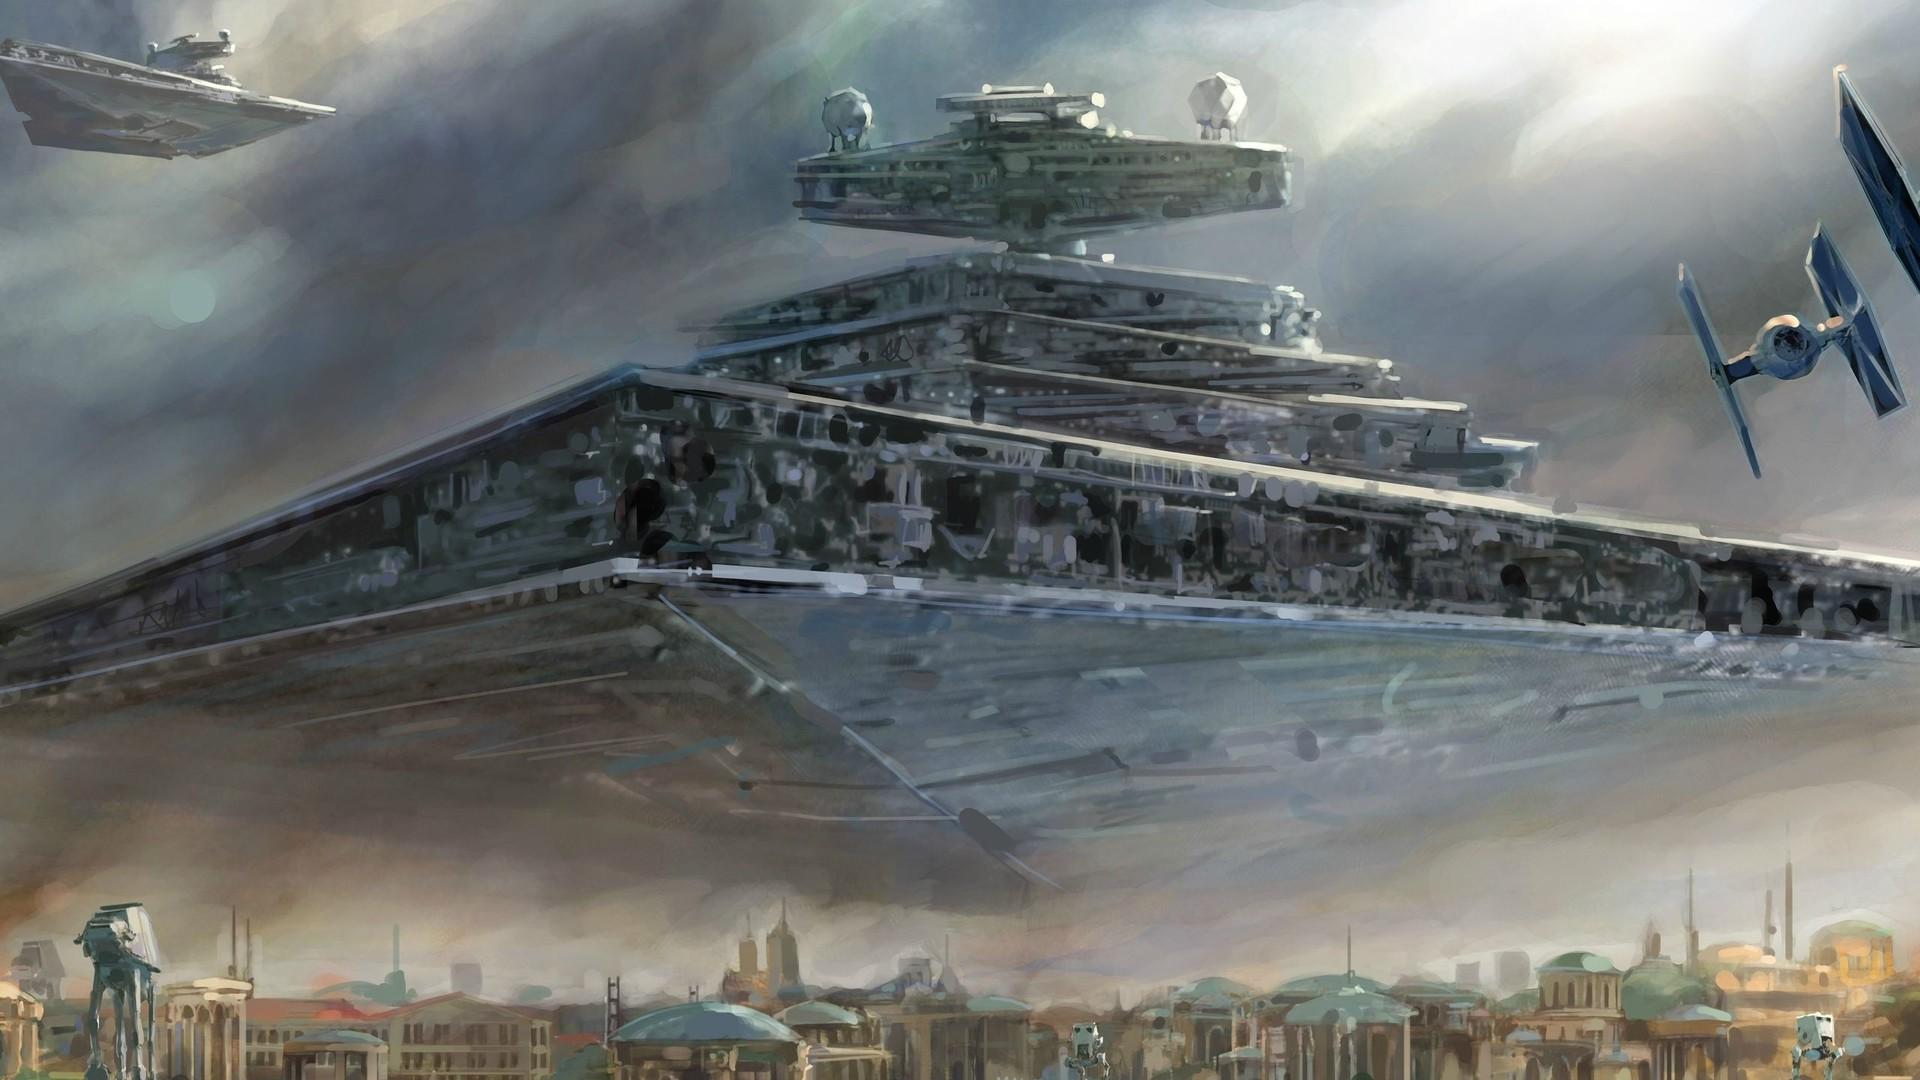 Description: Download Star wars spaceships atat artwork vehicles tie  fighters star wallpaper/desktop background in HD & Widescreen  resolution.